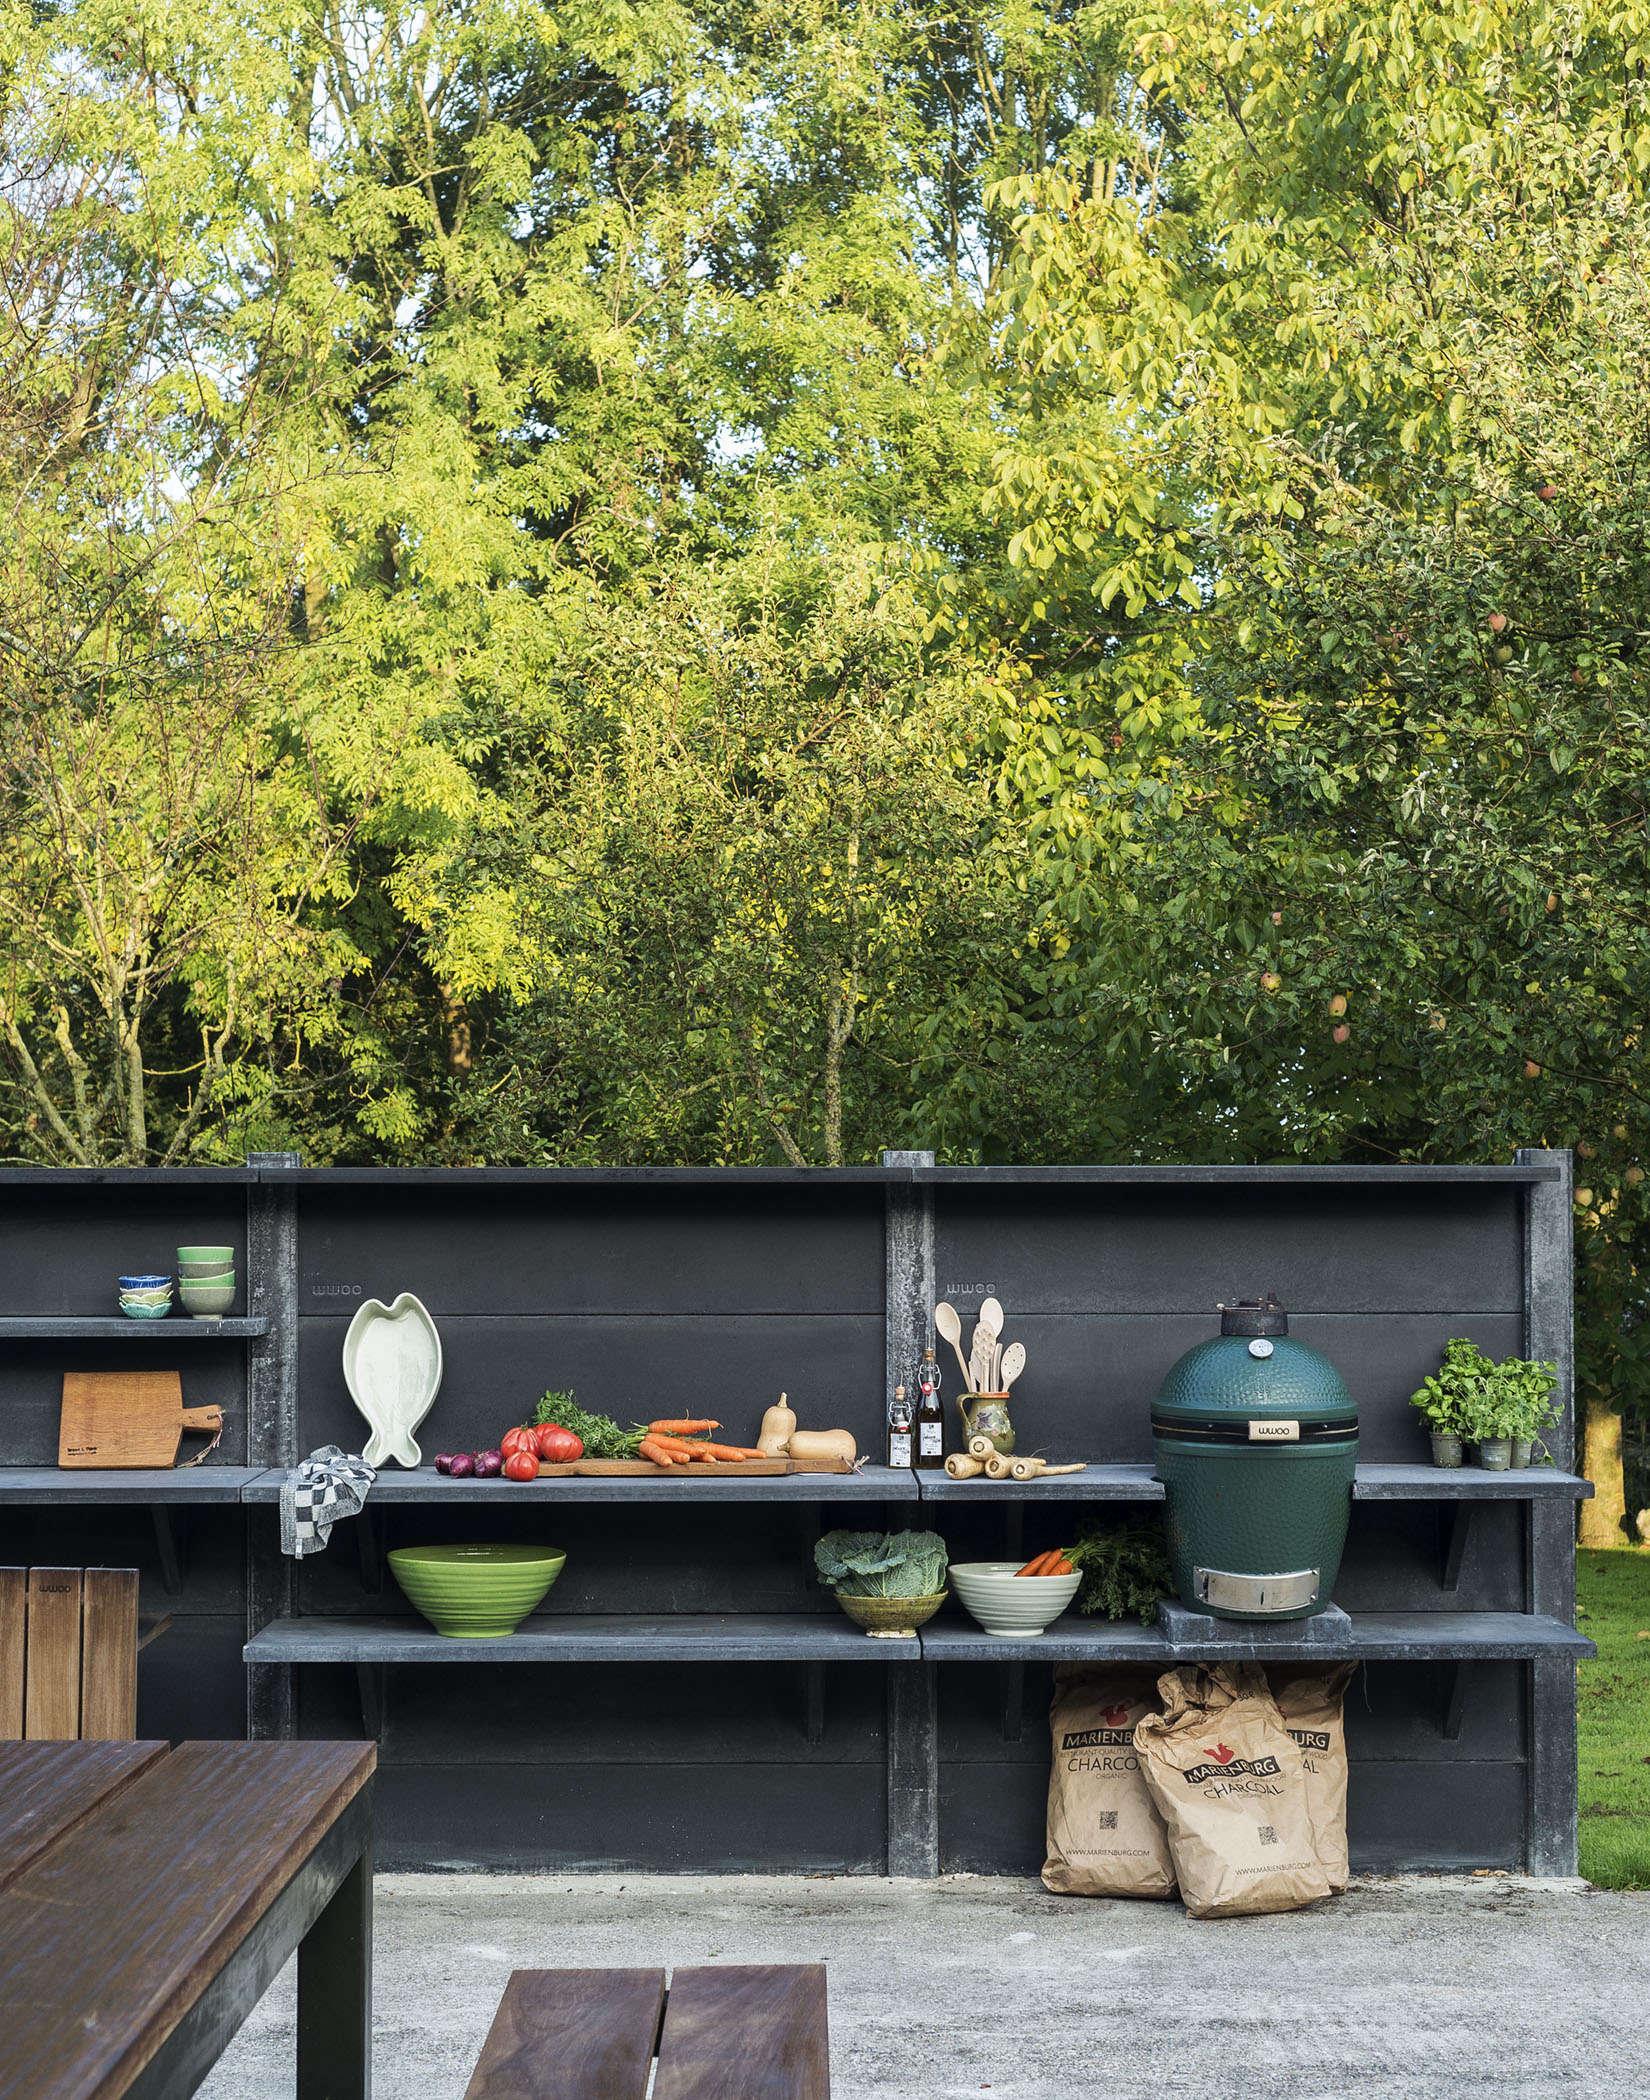 WWOO-outdoor-kitchen-big-green-egg-matthew-williams